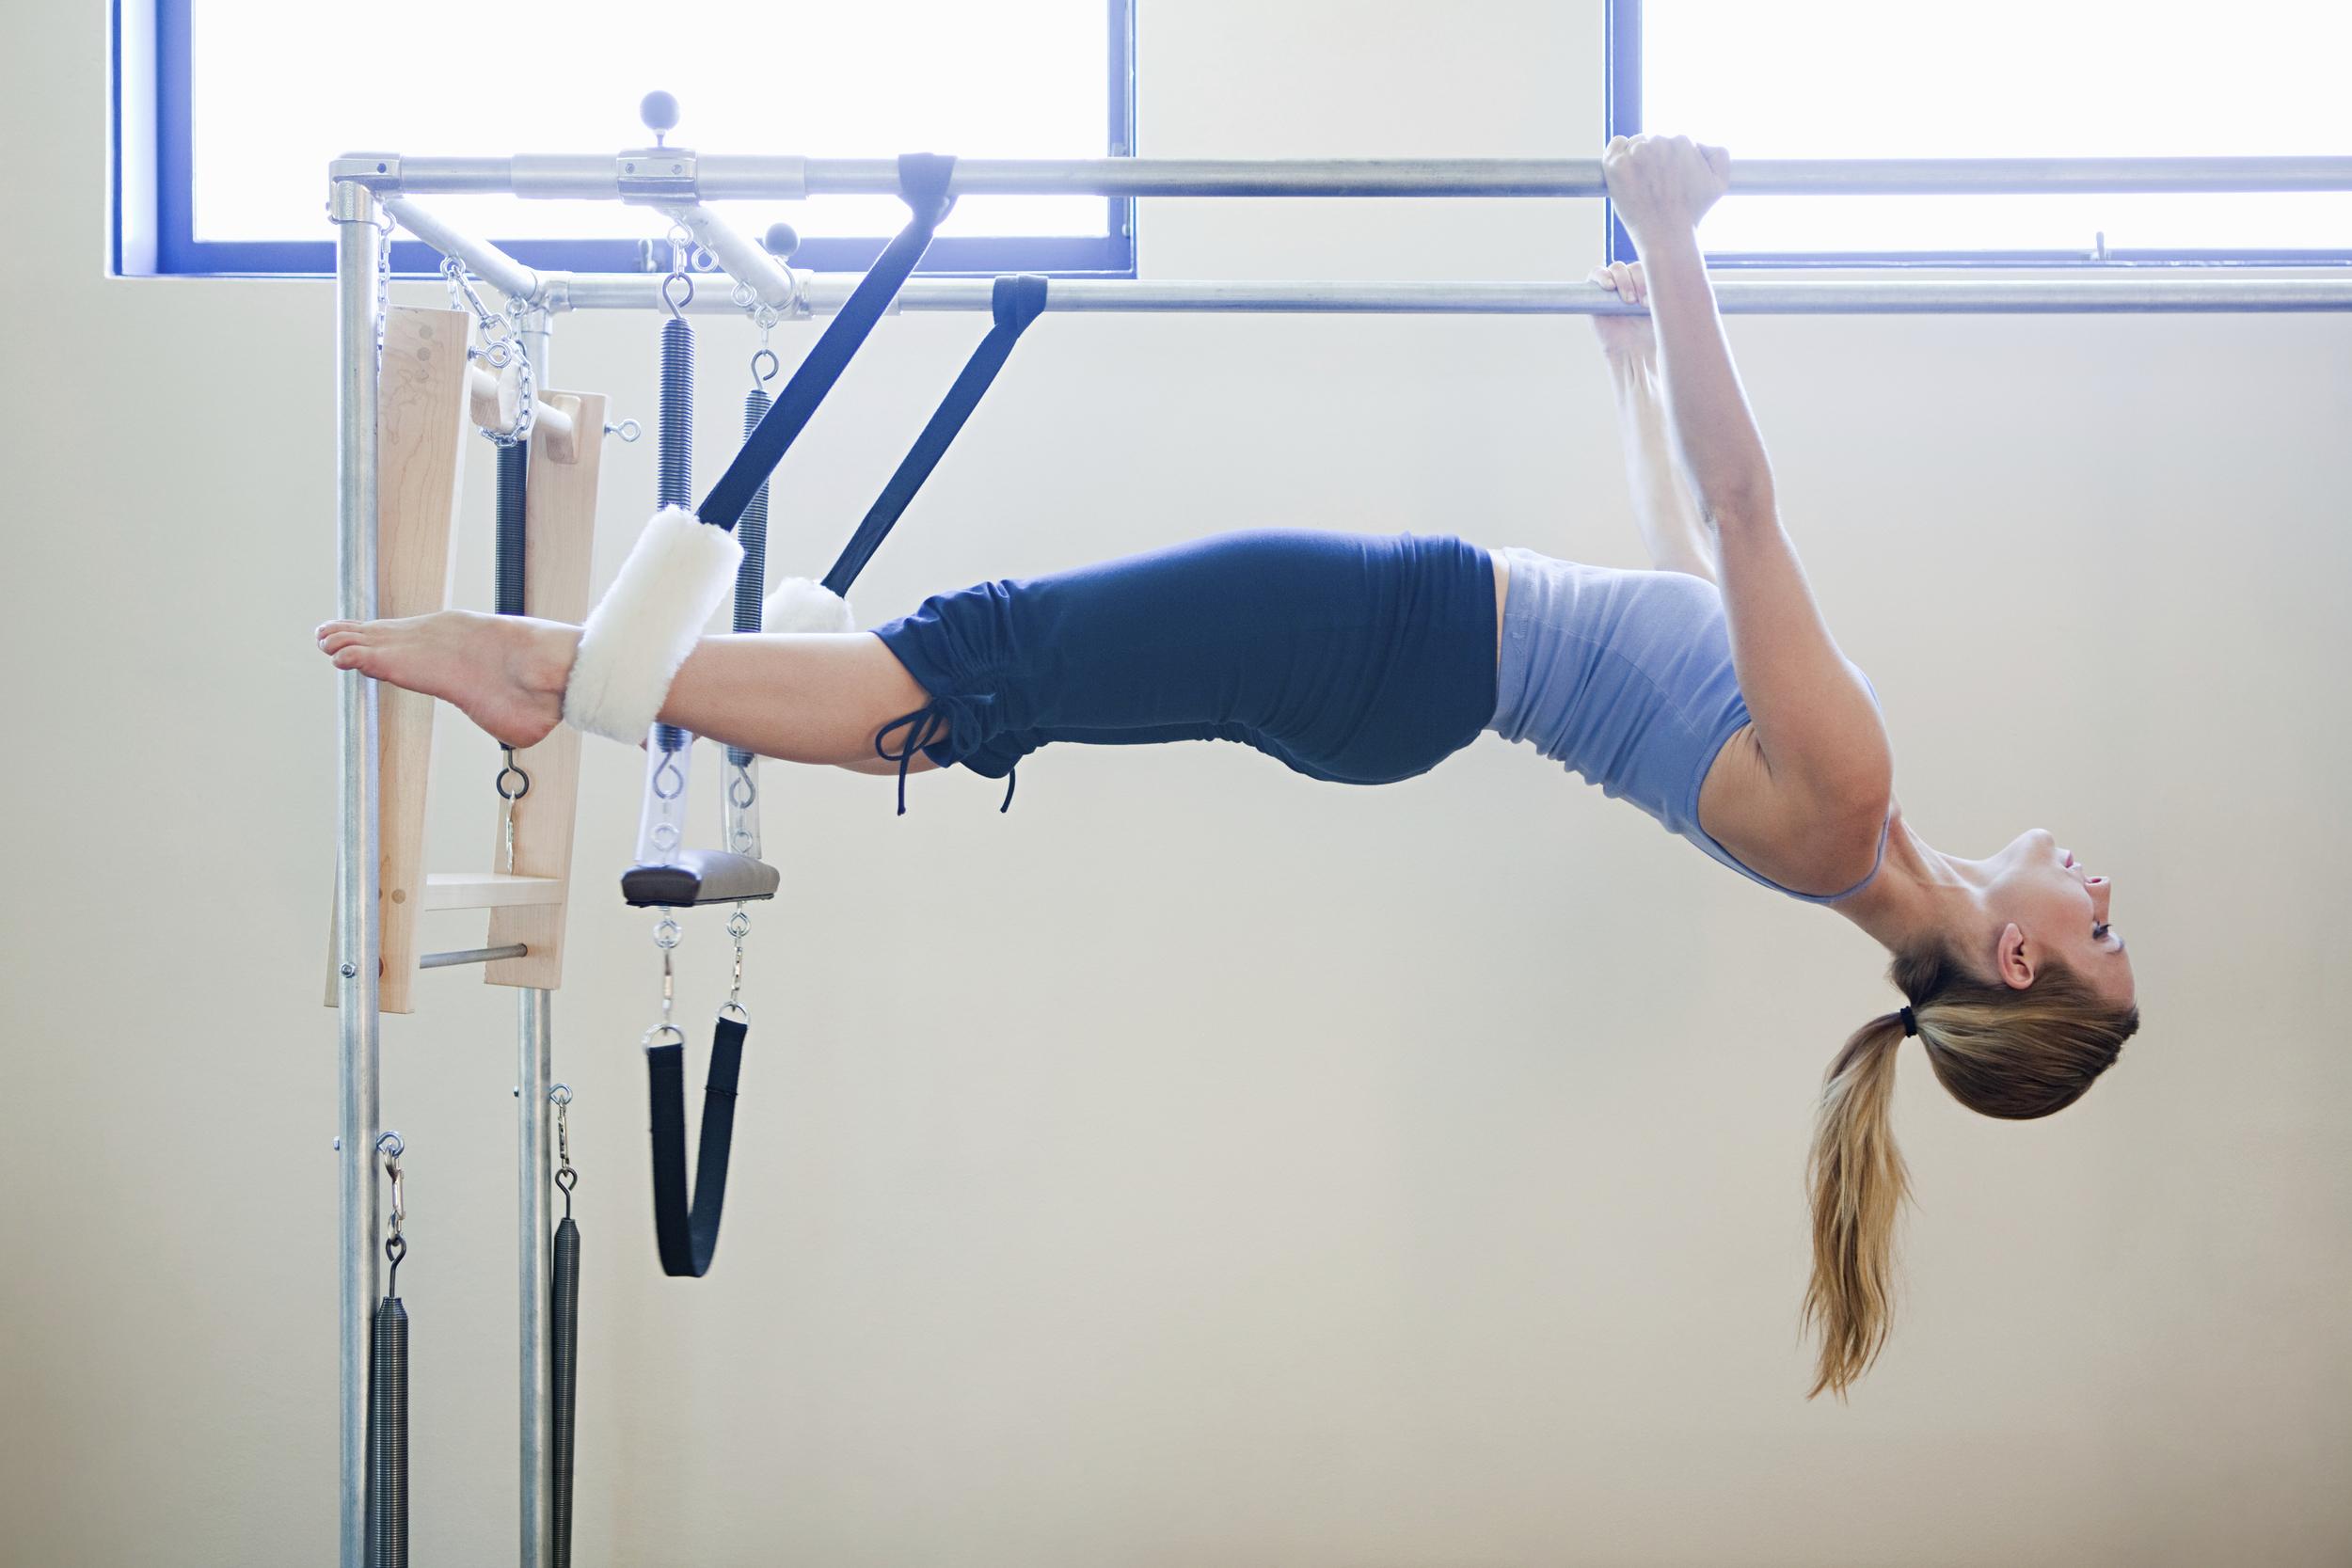 Total Body Workout - Pilates in La Jolla, CA